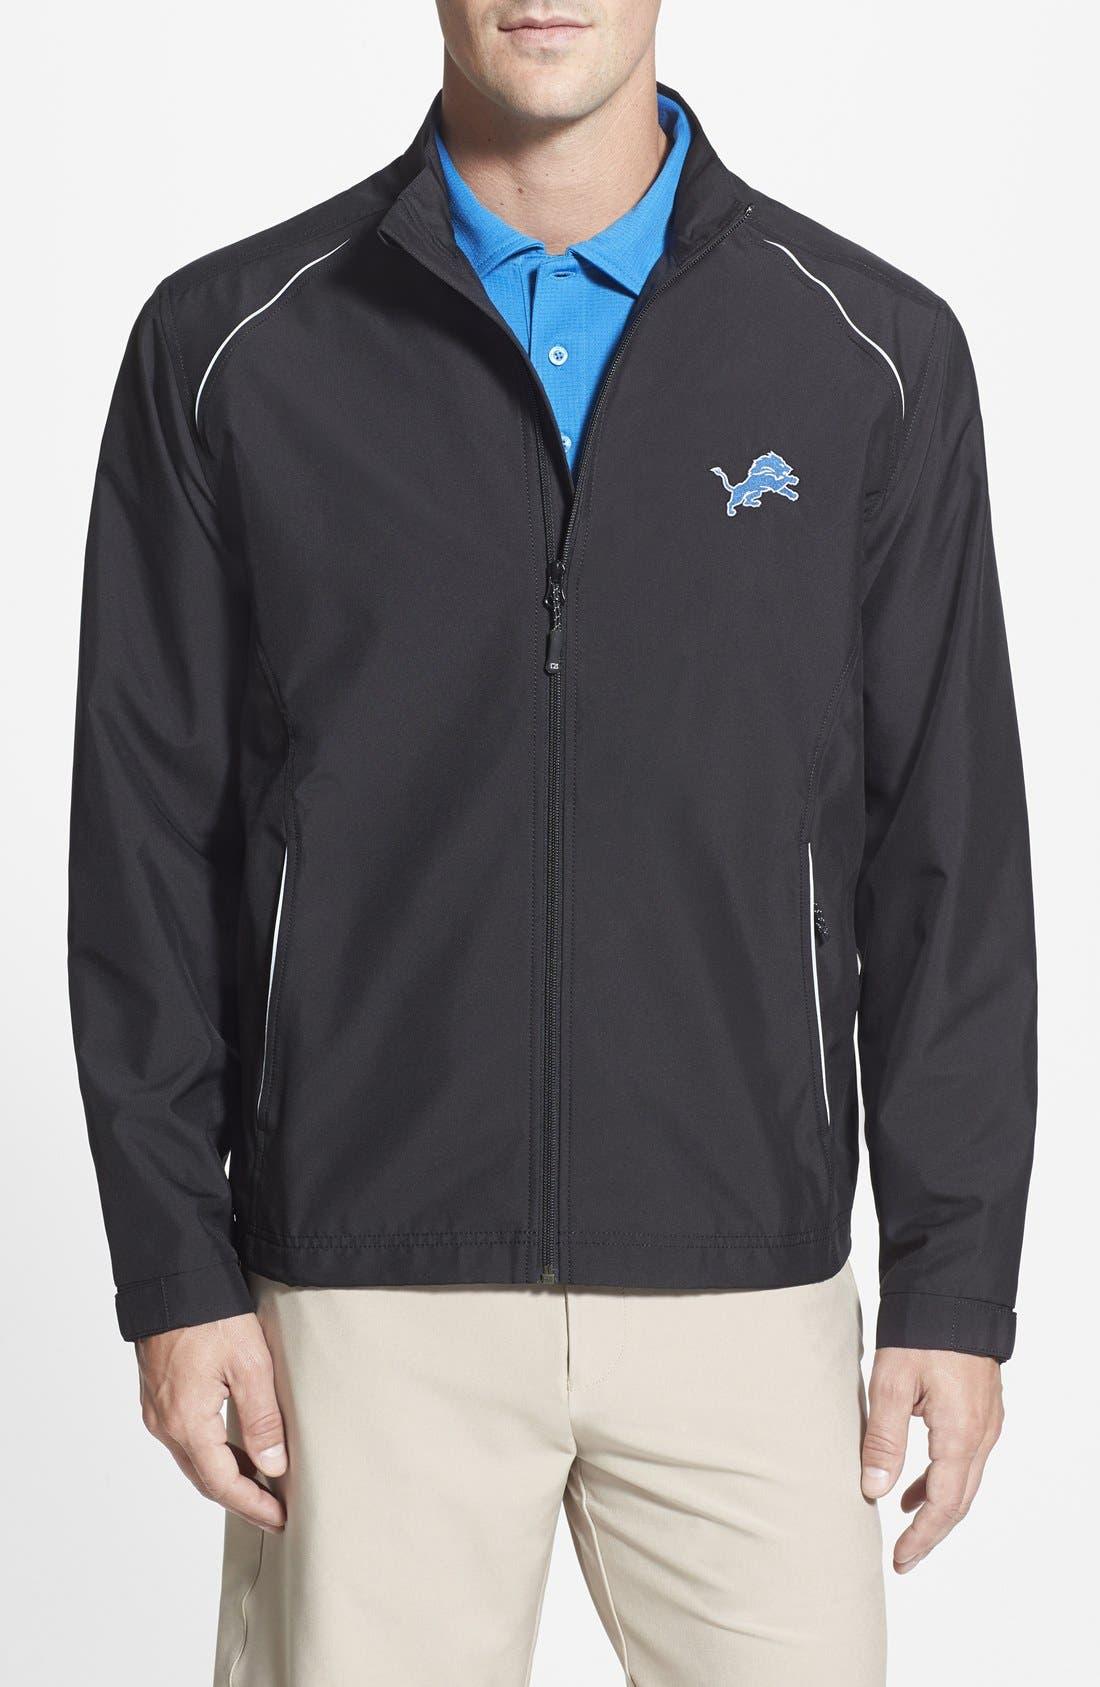 Main Image - Cutter & Buck Detroit Lions - Beacon WeatherTec Wind & Water Resistant Jacket